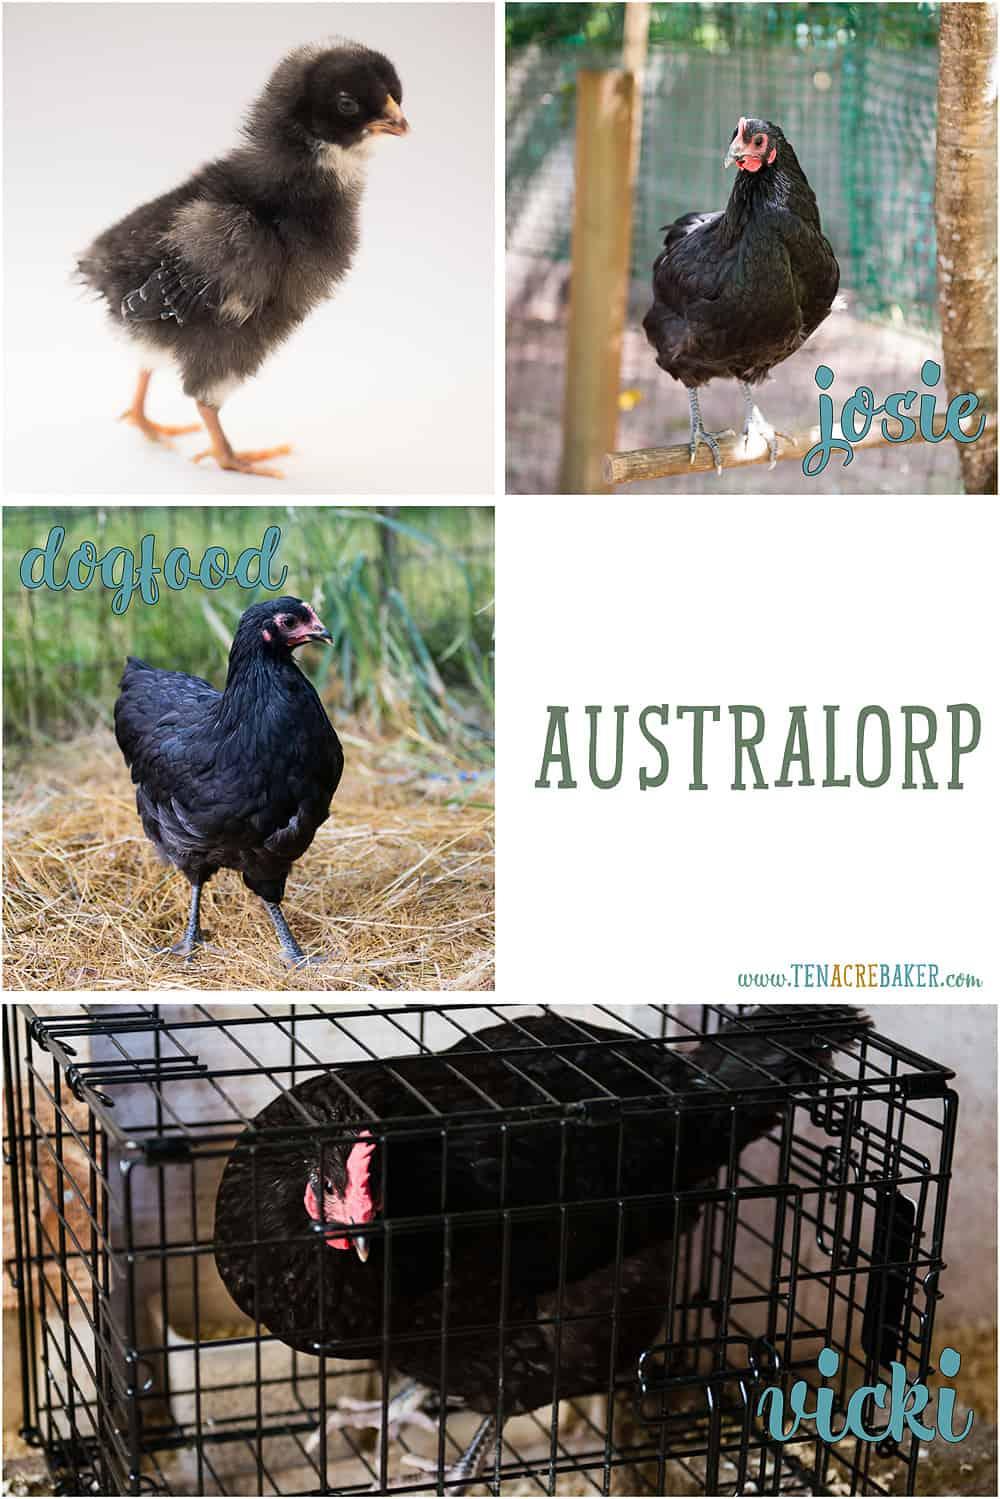 Australorp backyard chickens